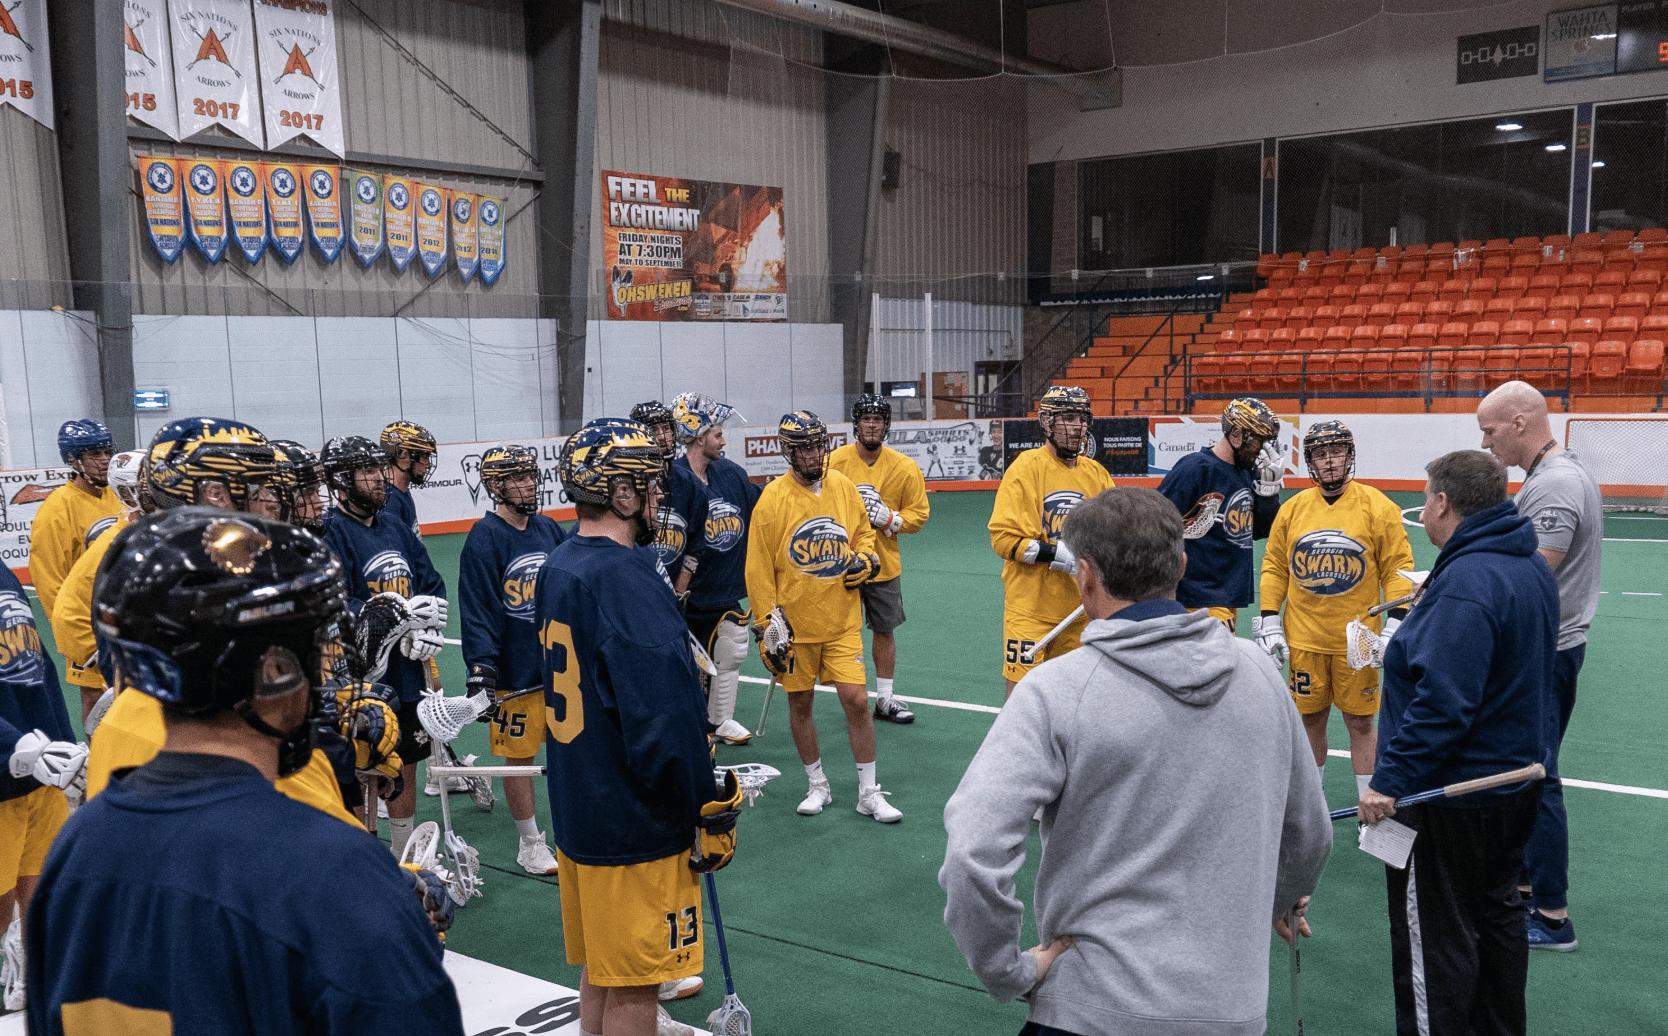 georgia swarm nll national lacrosse league pro lacrosse box lacrosse